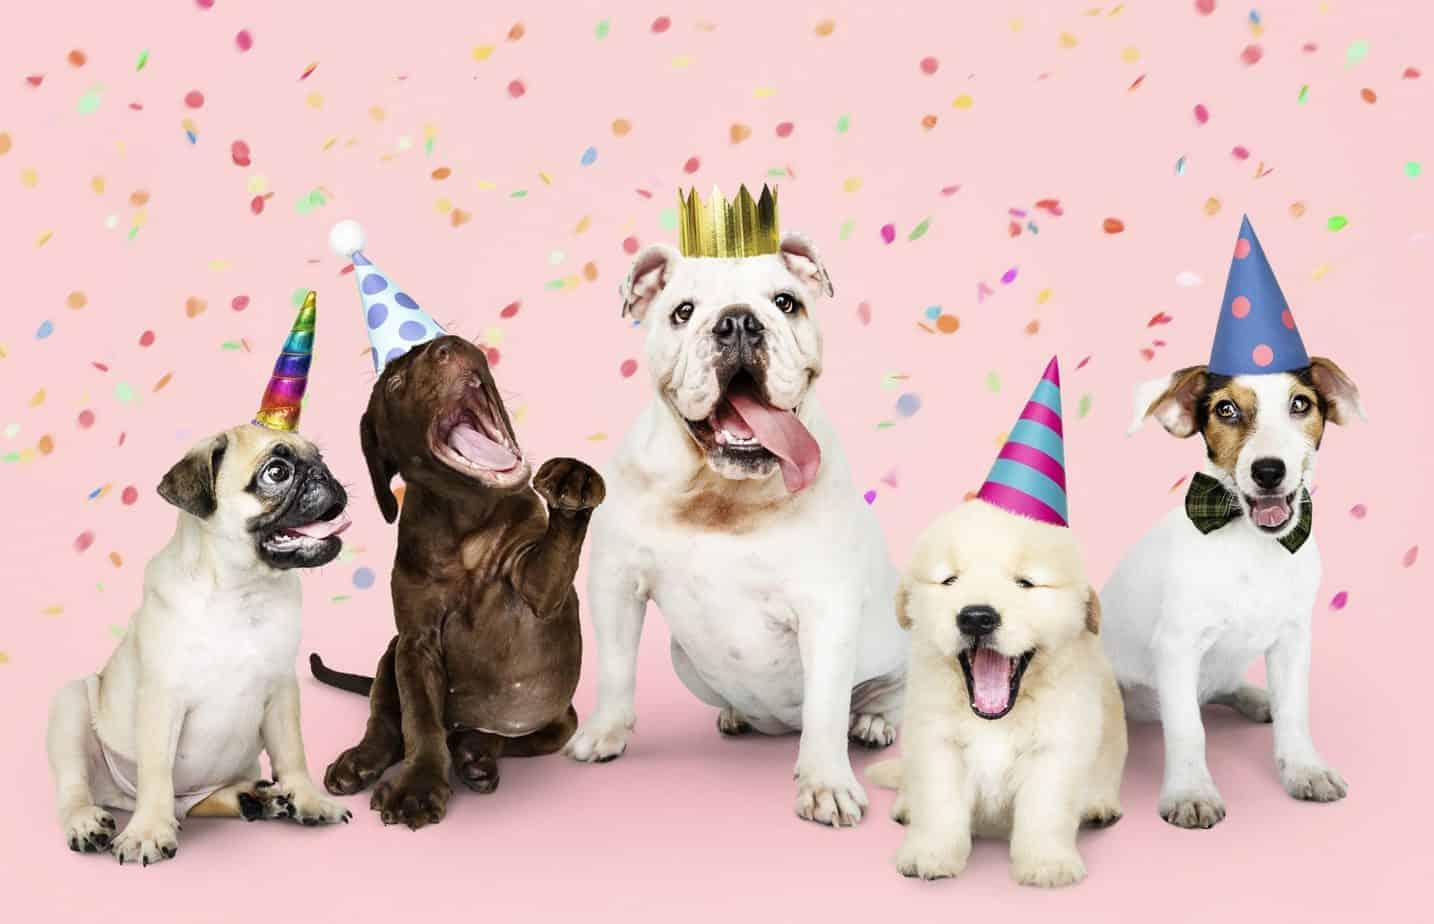 Dog milestones: Birthday, Gotcha Day, Christmas and more